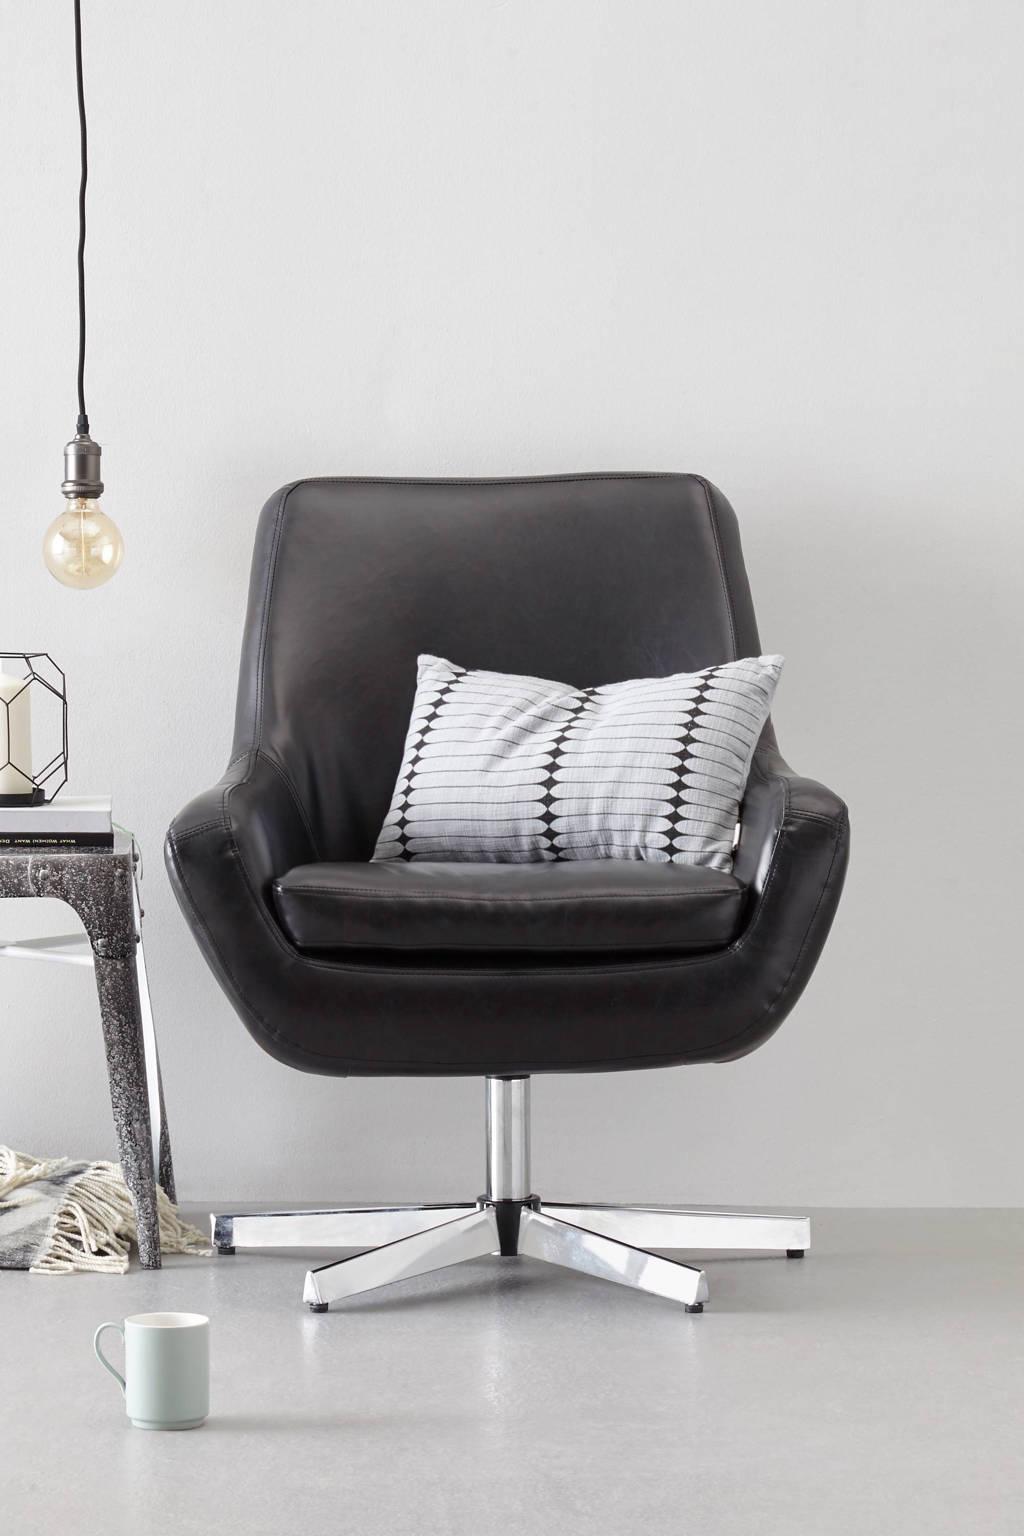 whkmp's own fauteuil Don, Zwart